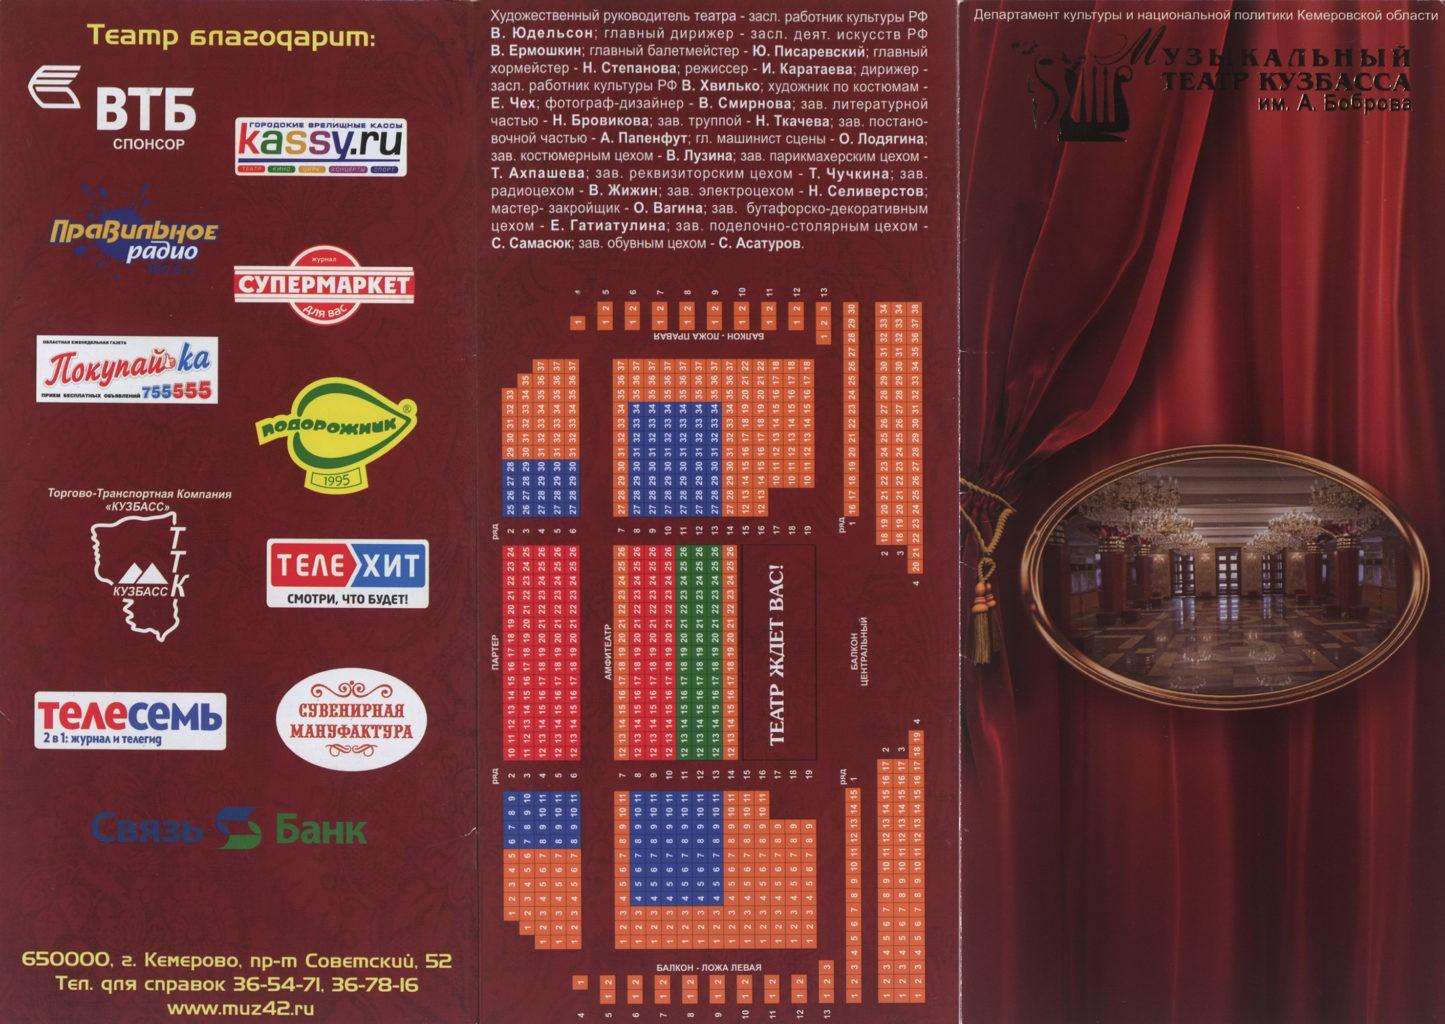 Музыкальный театр Кузбасса им. А. Боброва. Репертуар театра, 2014 г.: буклет